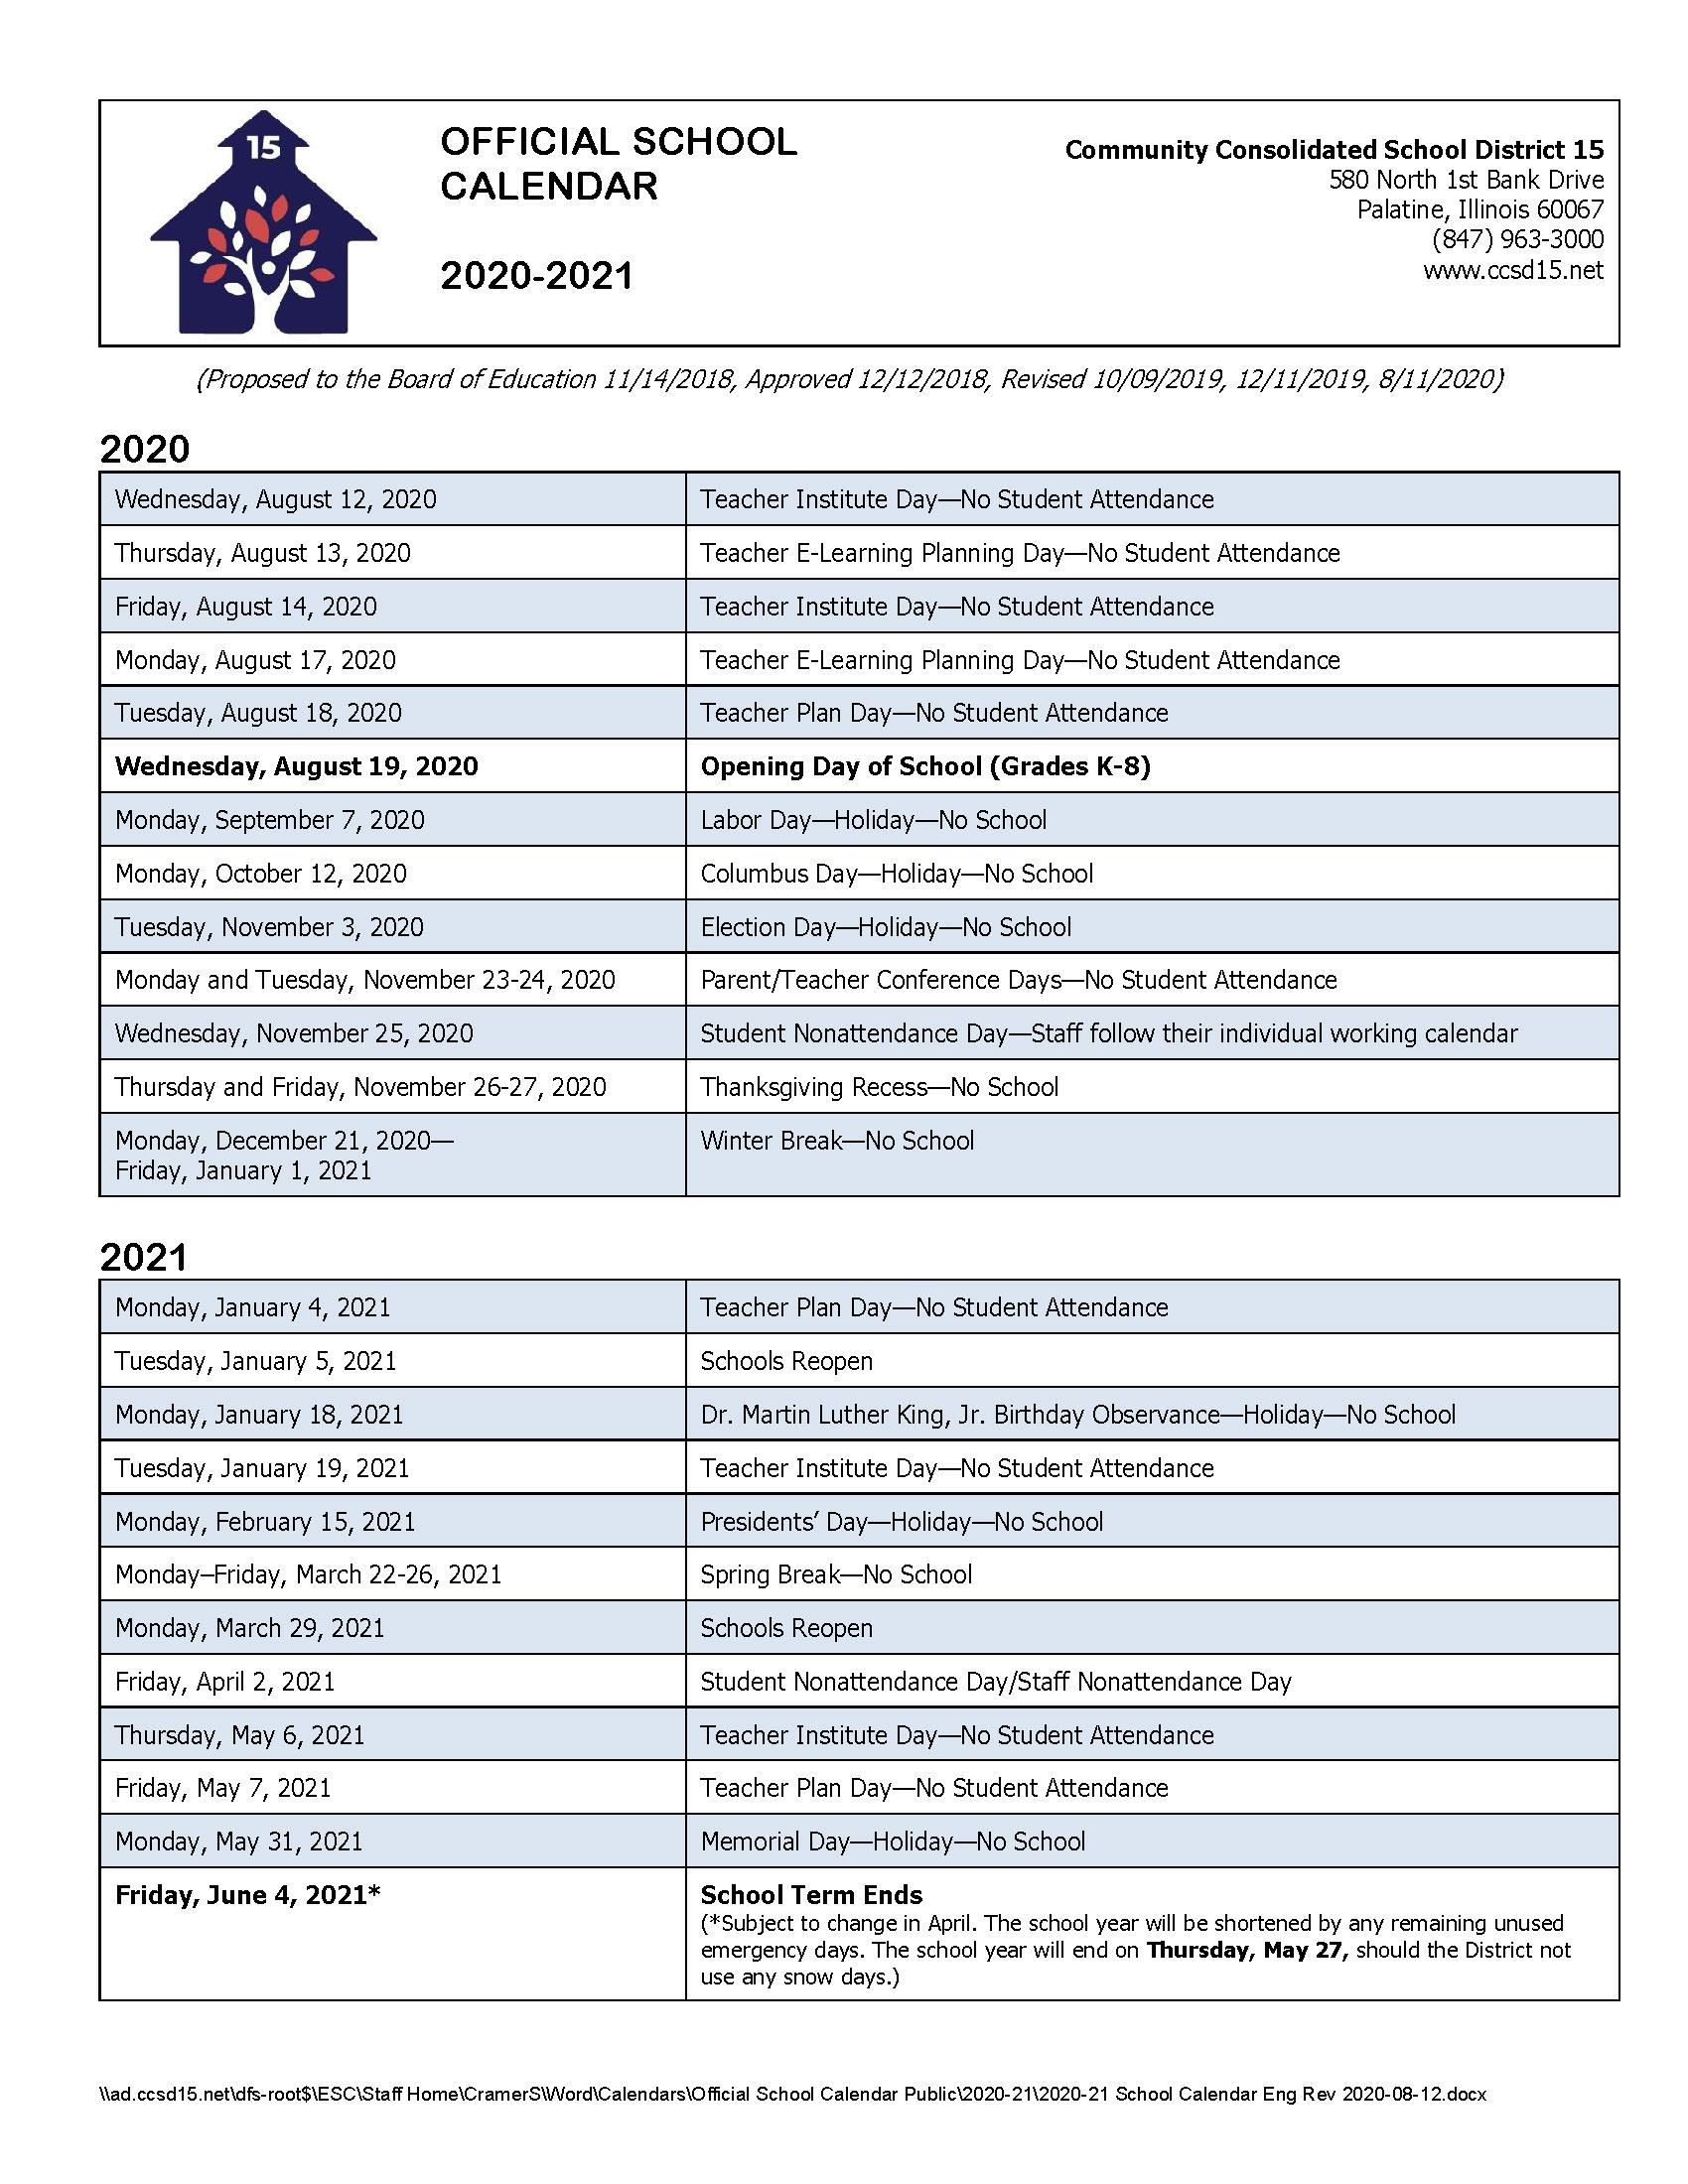 Ccsd Academic Calendar 2021-22 Calendars / 2020 21 Official School Calendar